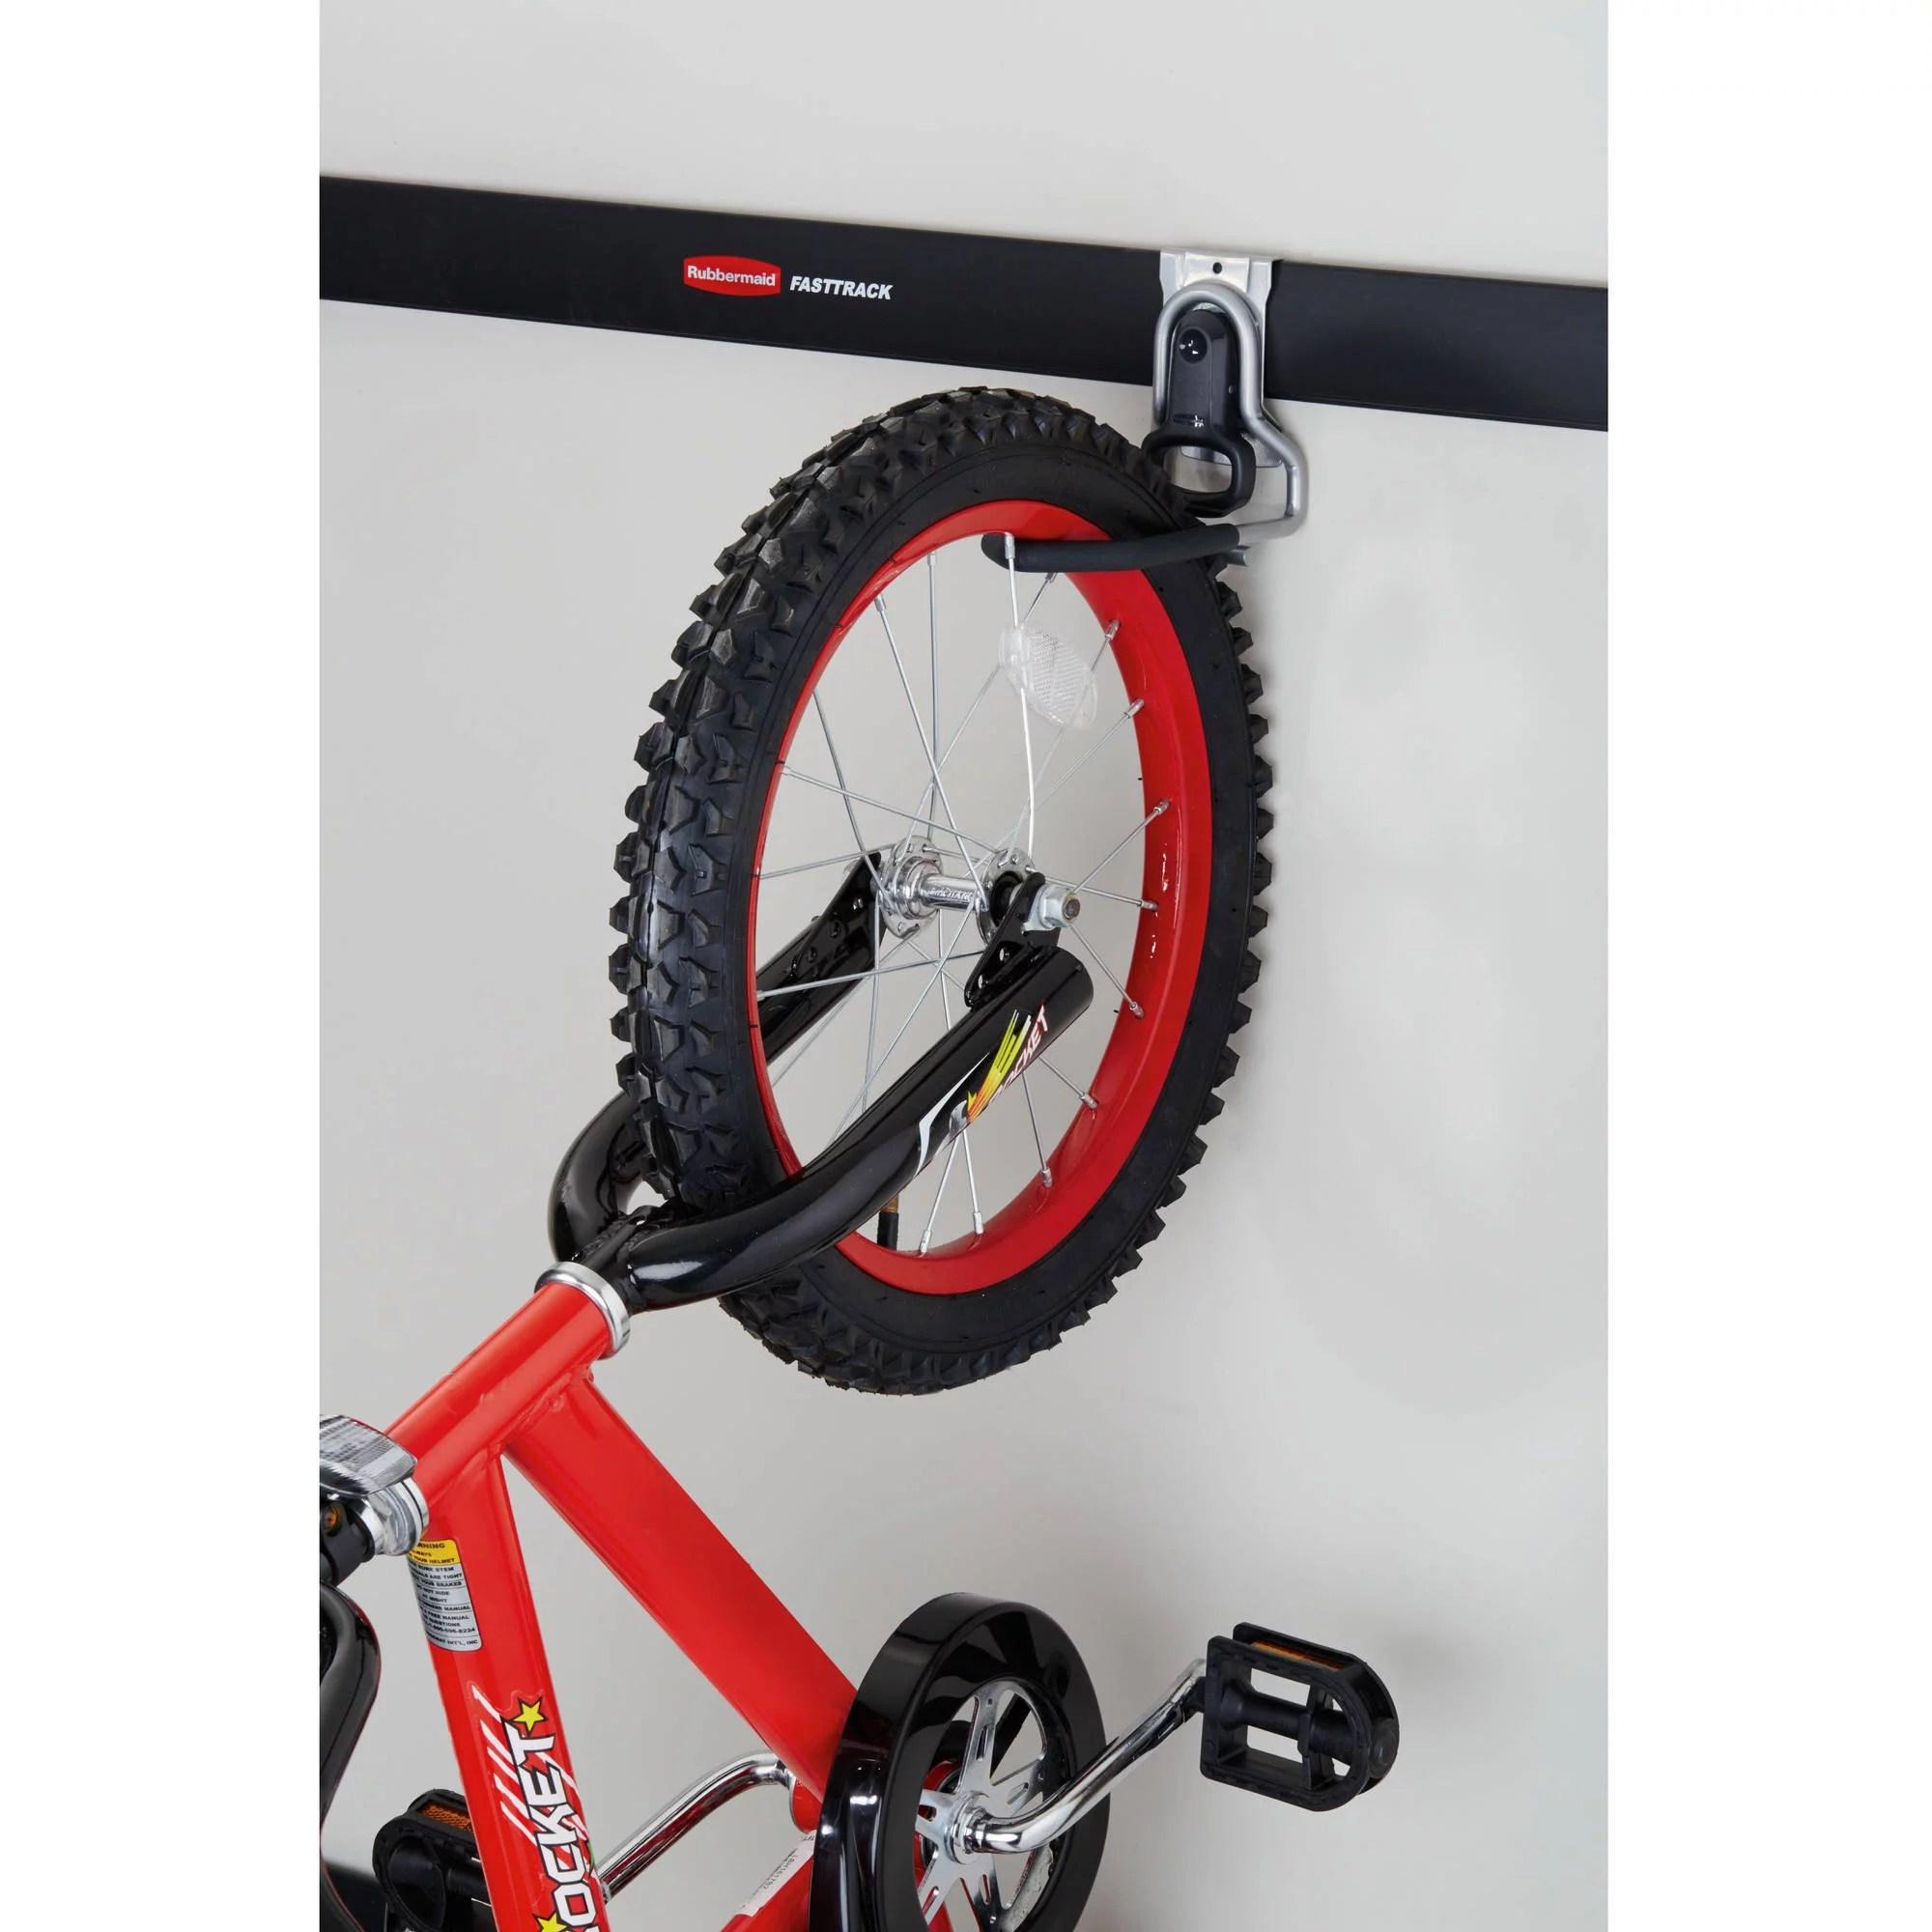 rubbermaid fasttrack garage storage wall mounted vertical bike hook